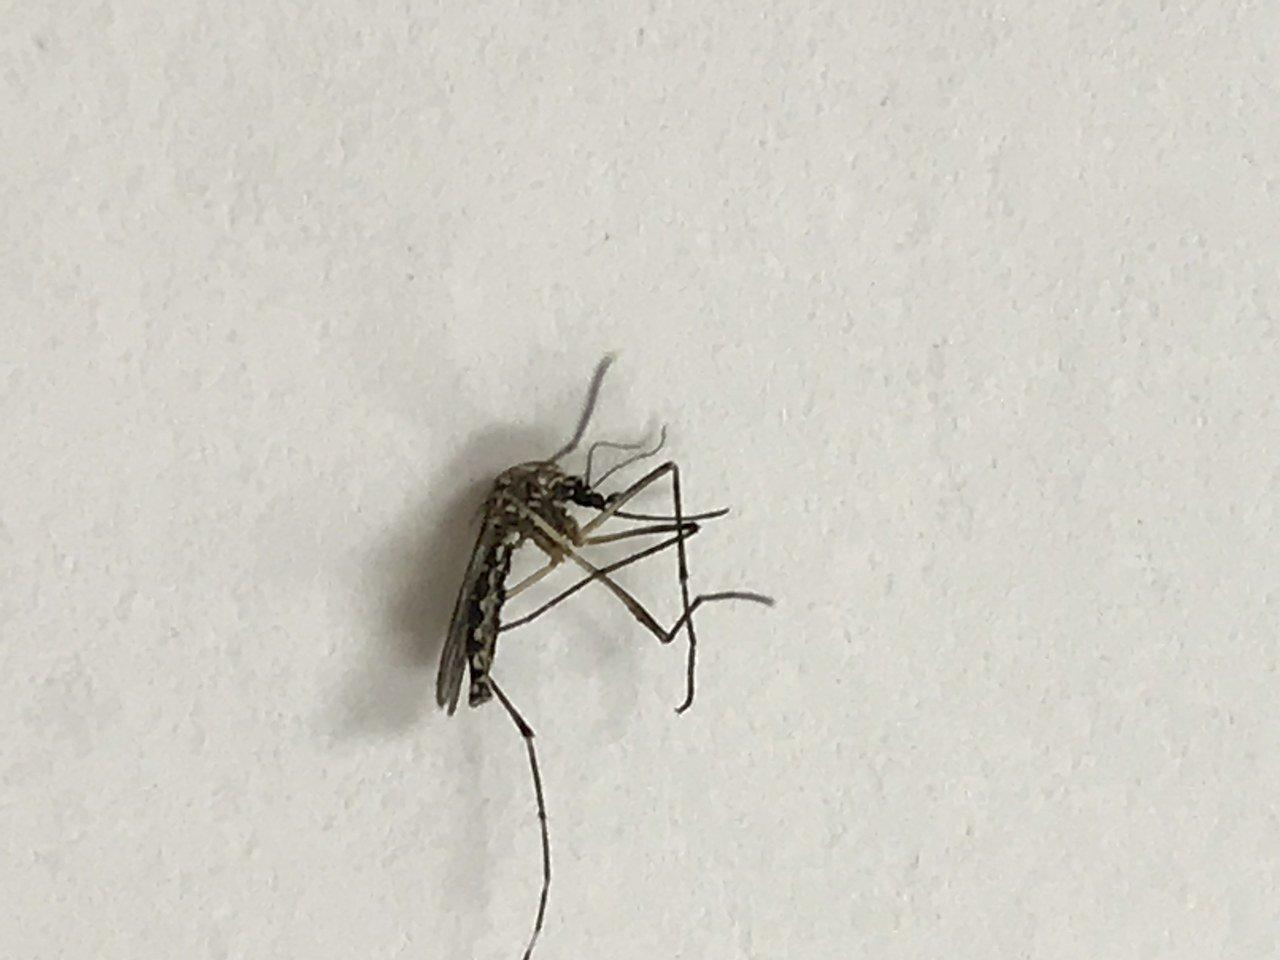 Identifying Mosquito Species using Smart-phone camera